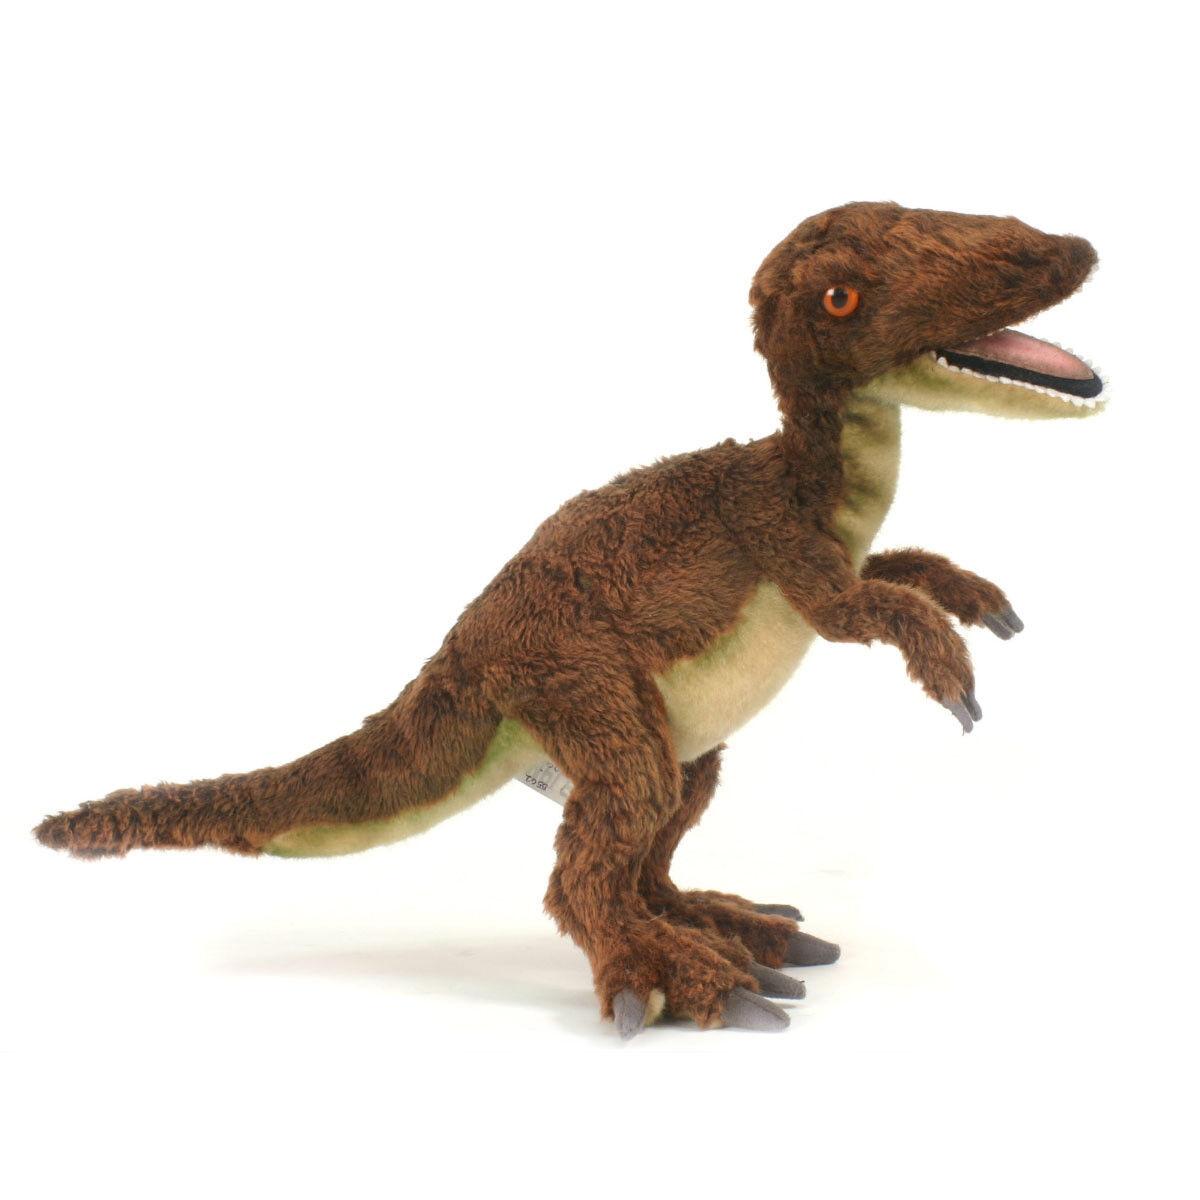 Velociraptor Dinosaur Hansa Realistic Animal Plush Toy 48cm FREE DELIVERY